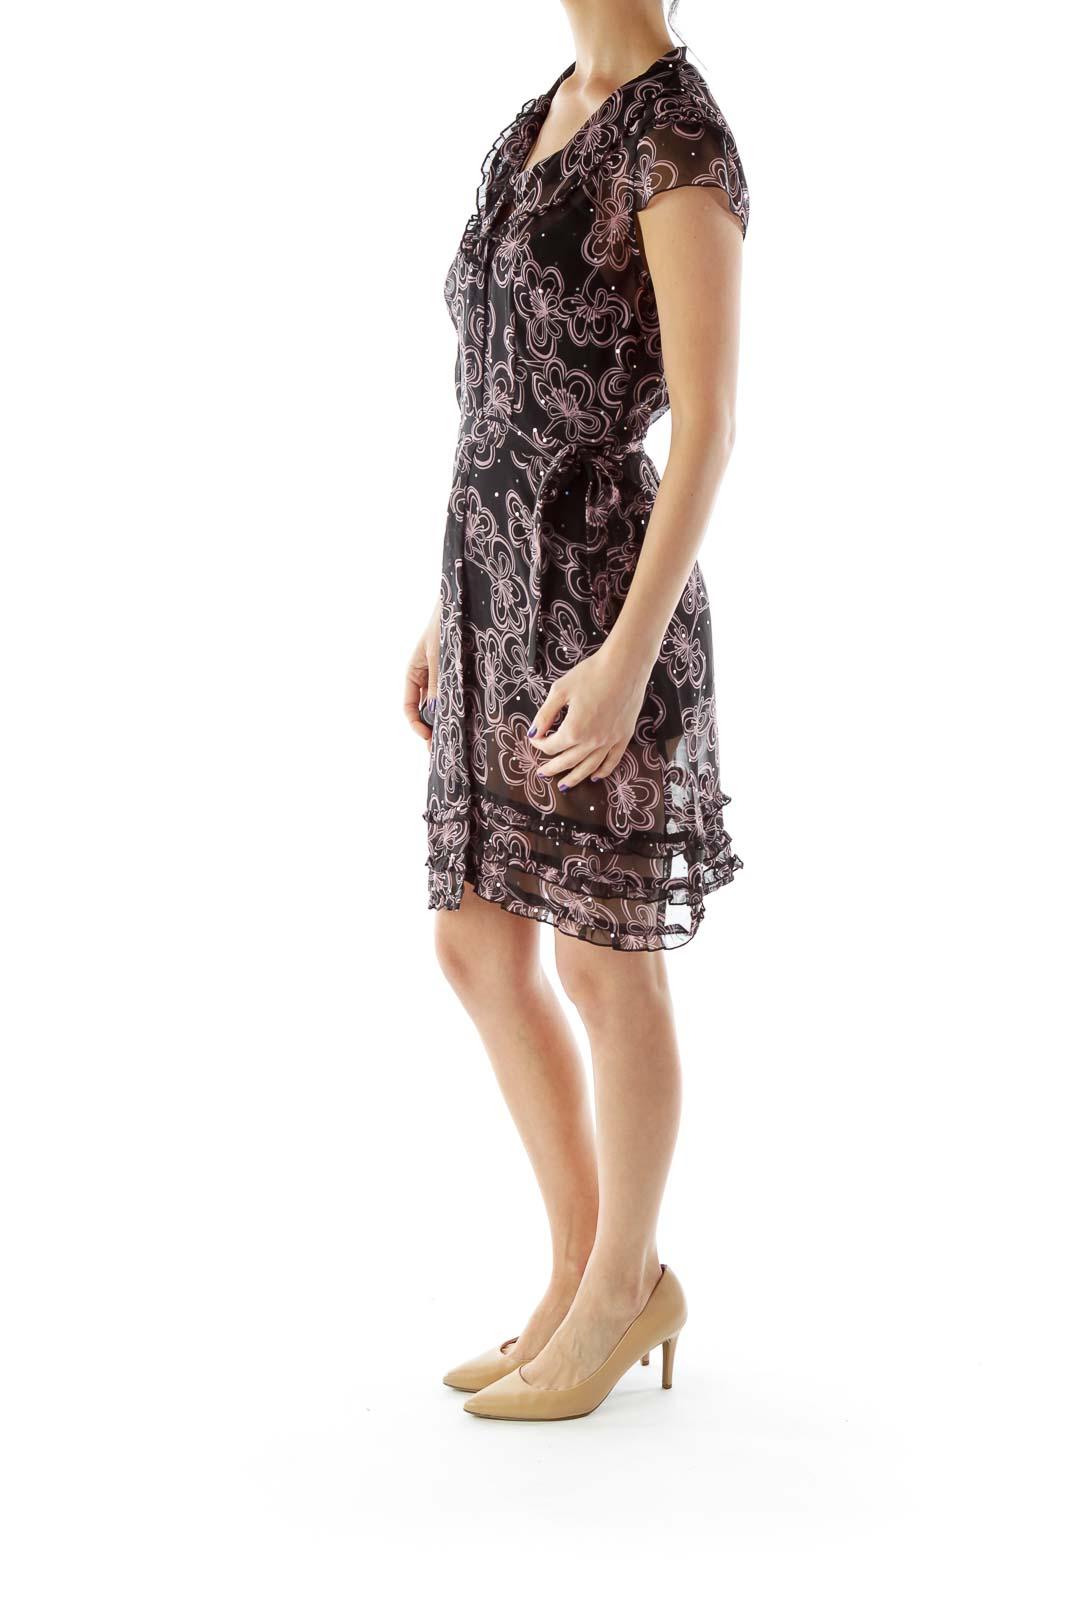 Black Sheer Dress with Sparkles